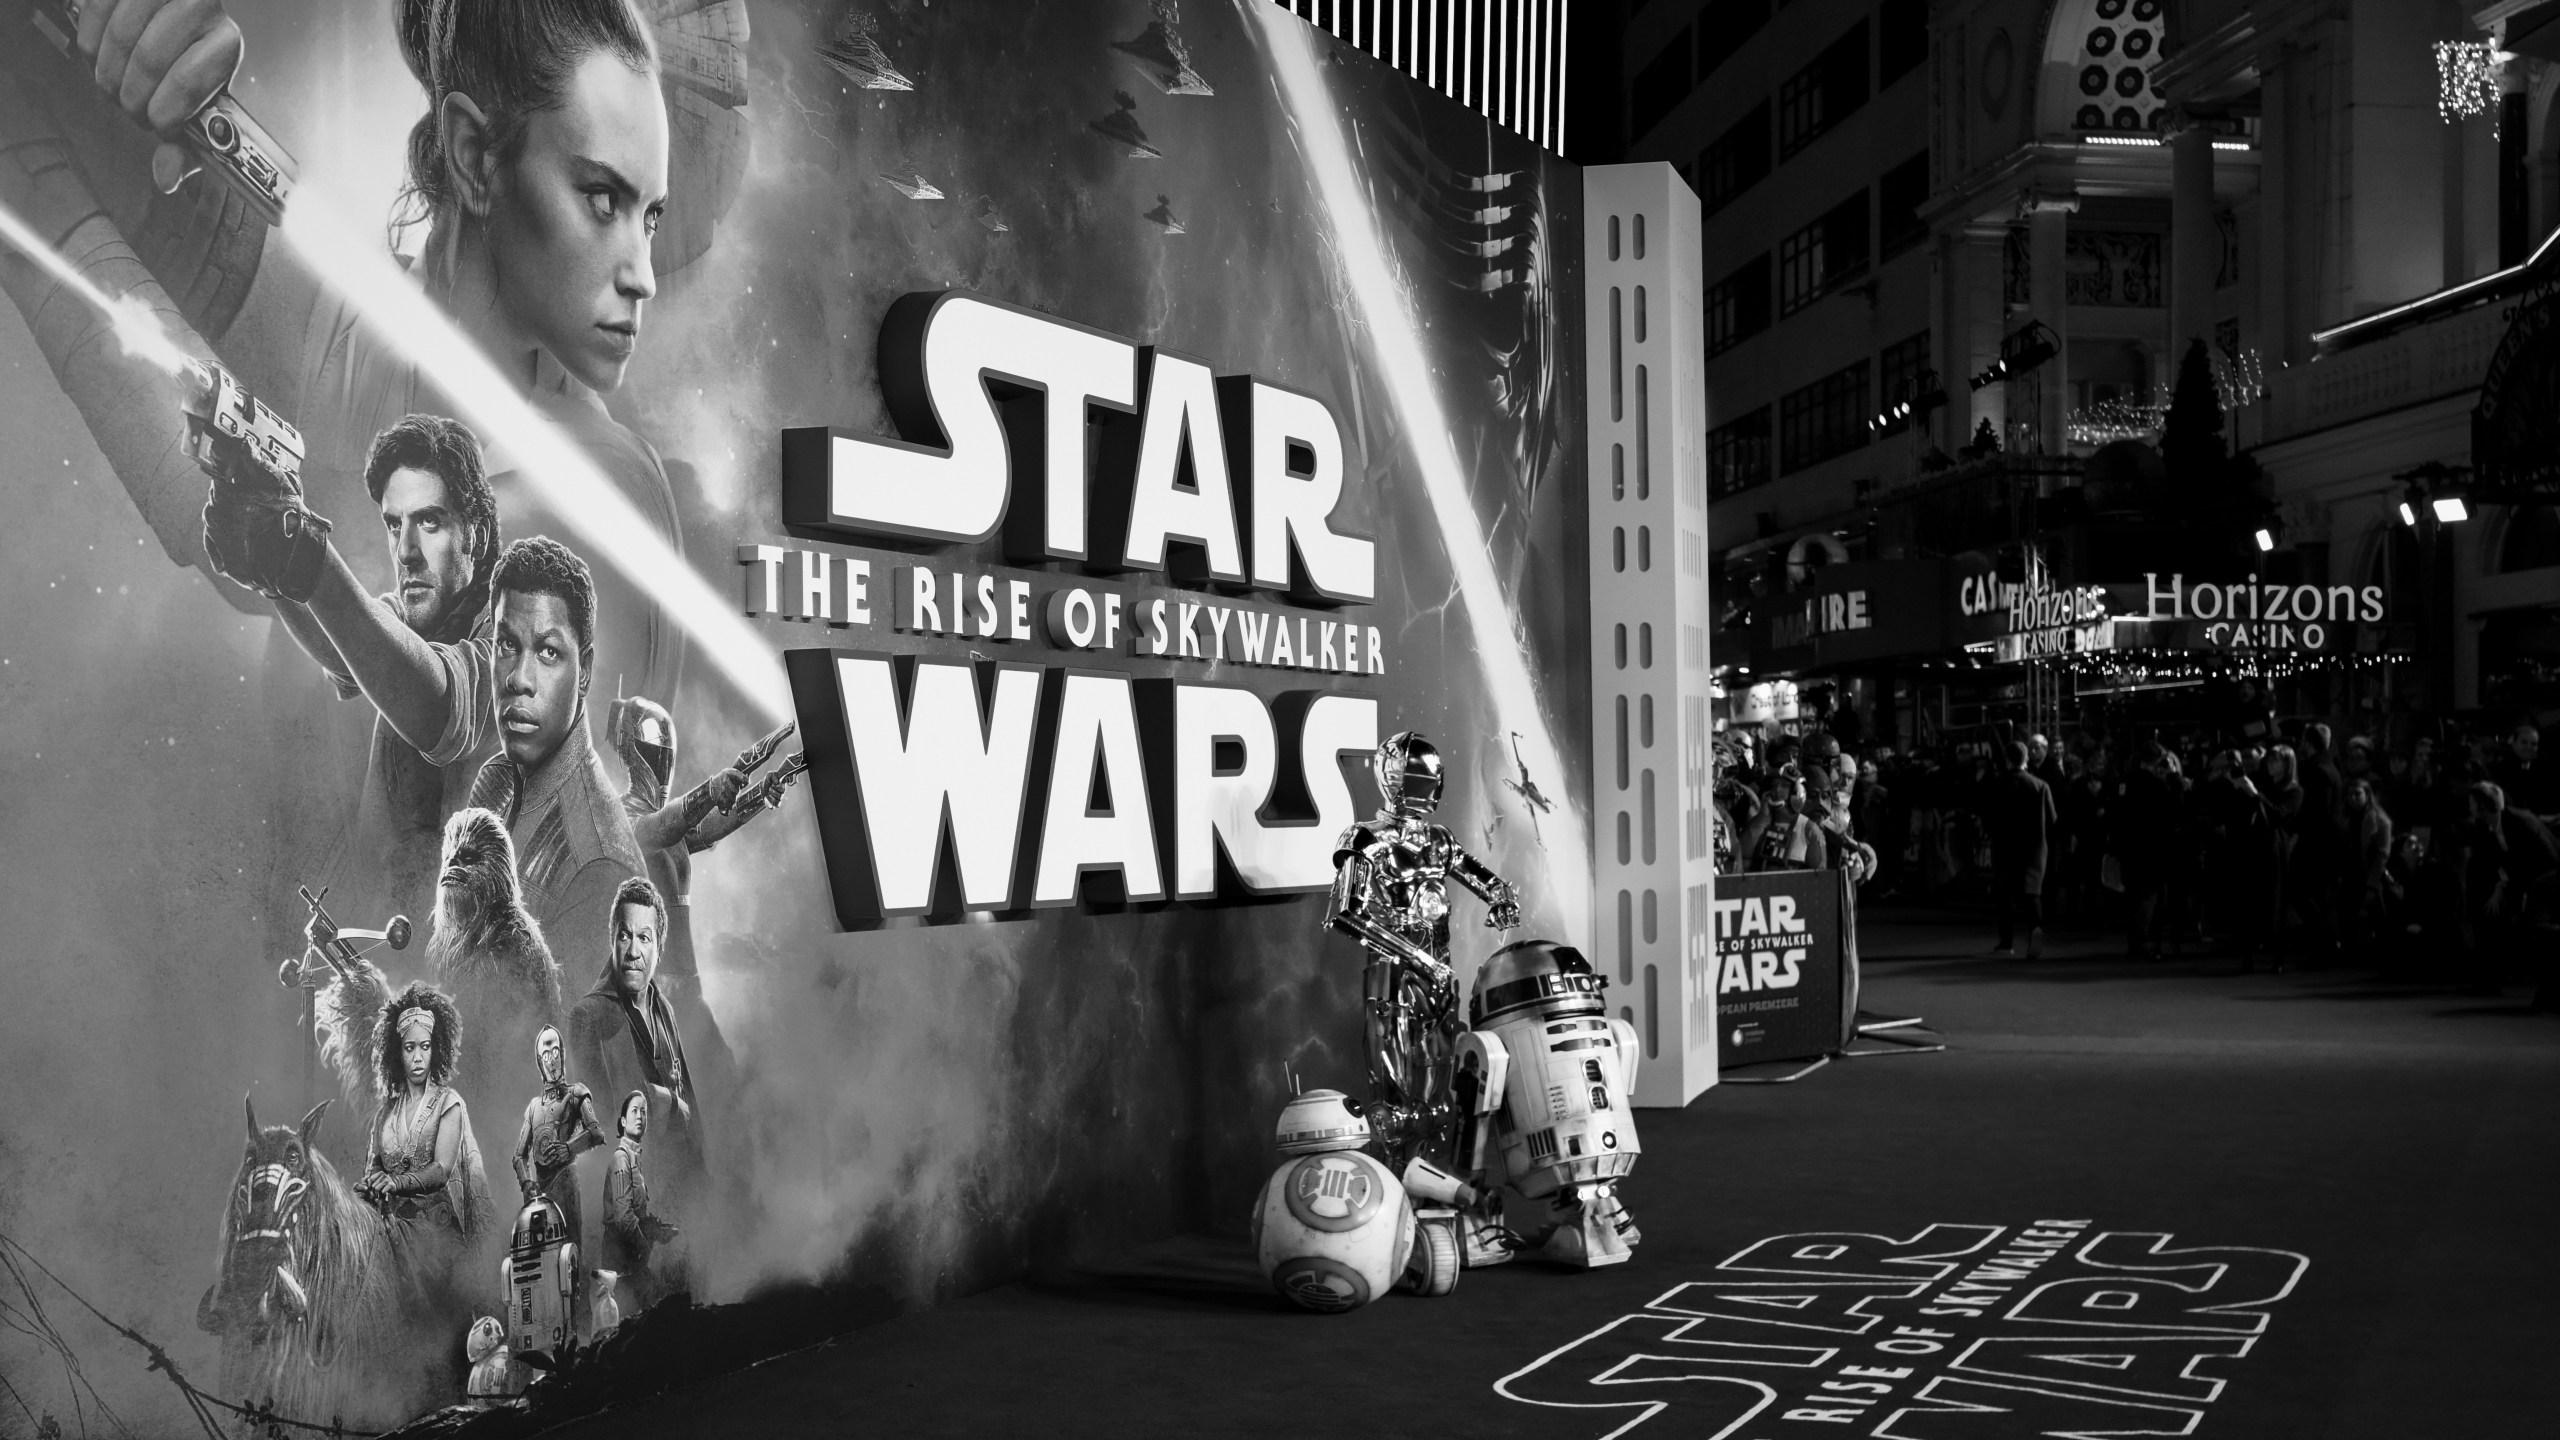 """Star Wars: The Rise of Skywalker"" on Dec. 18, 2019 in London, England. (Credit: Gareth Cattermole/Getty)"